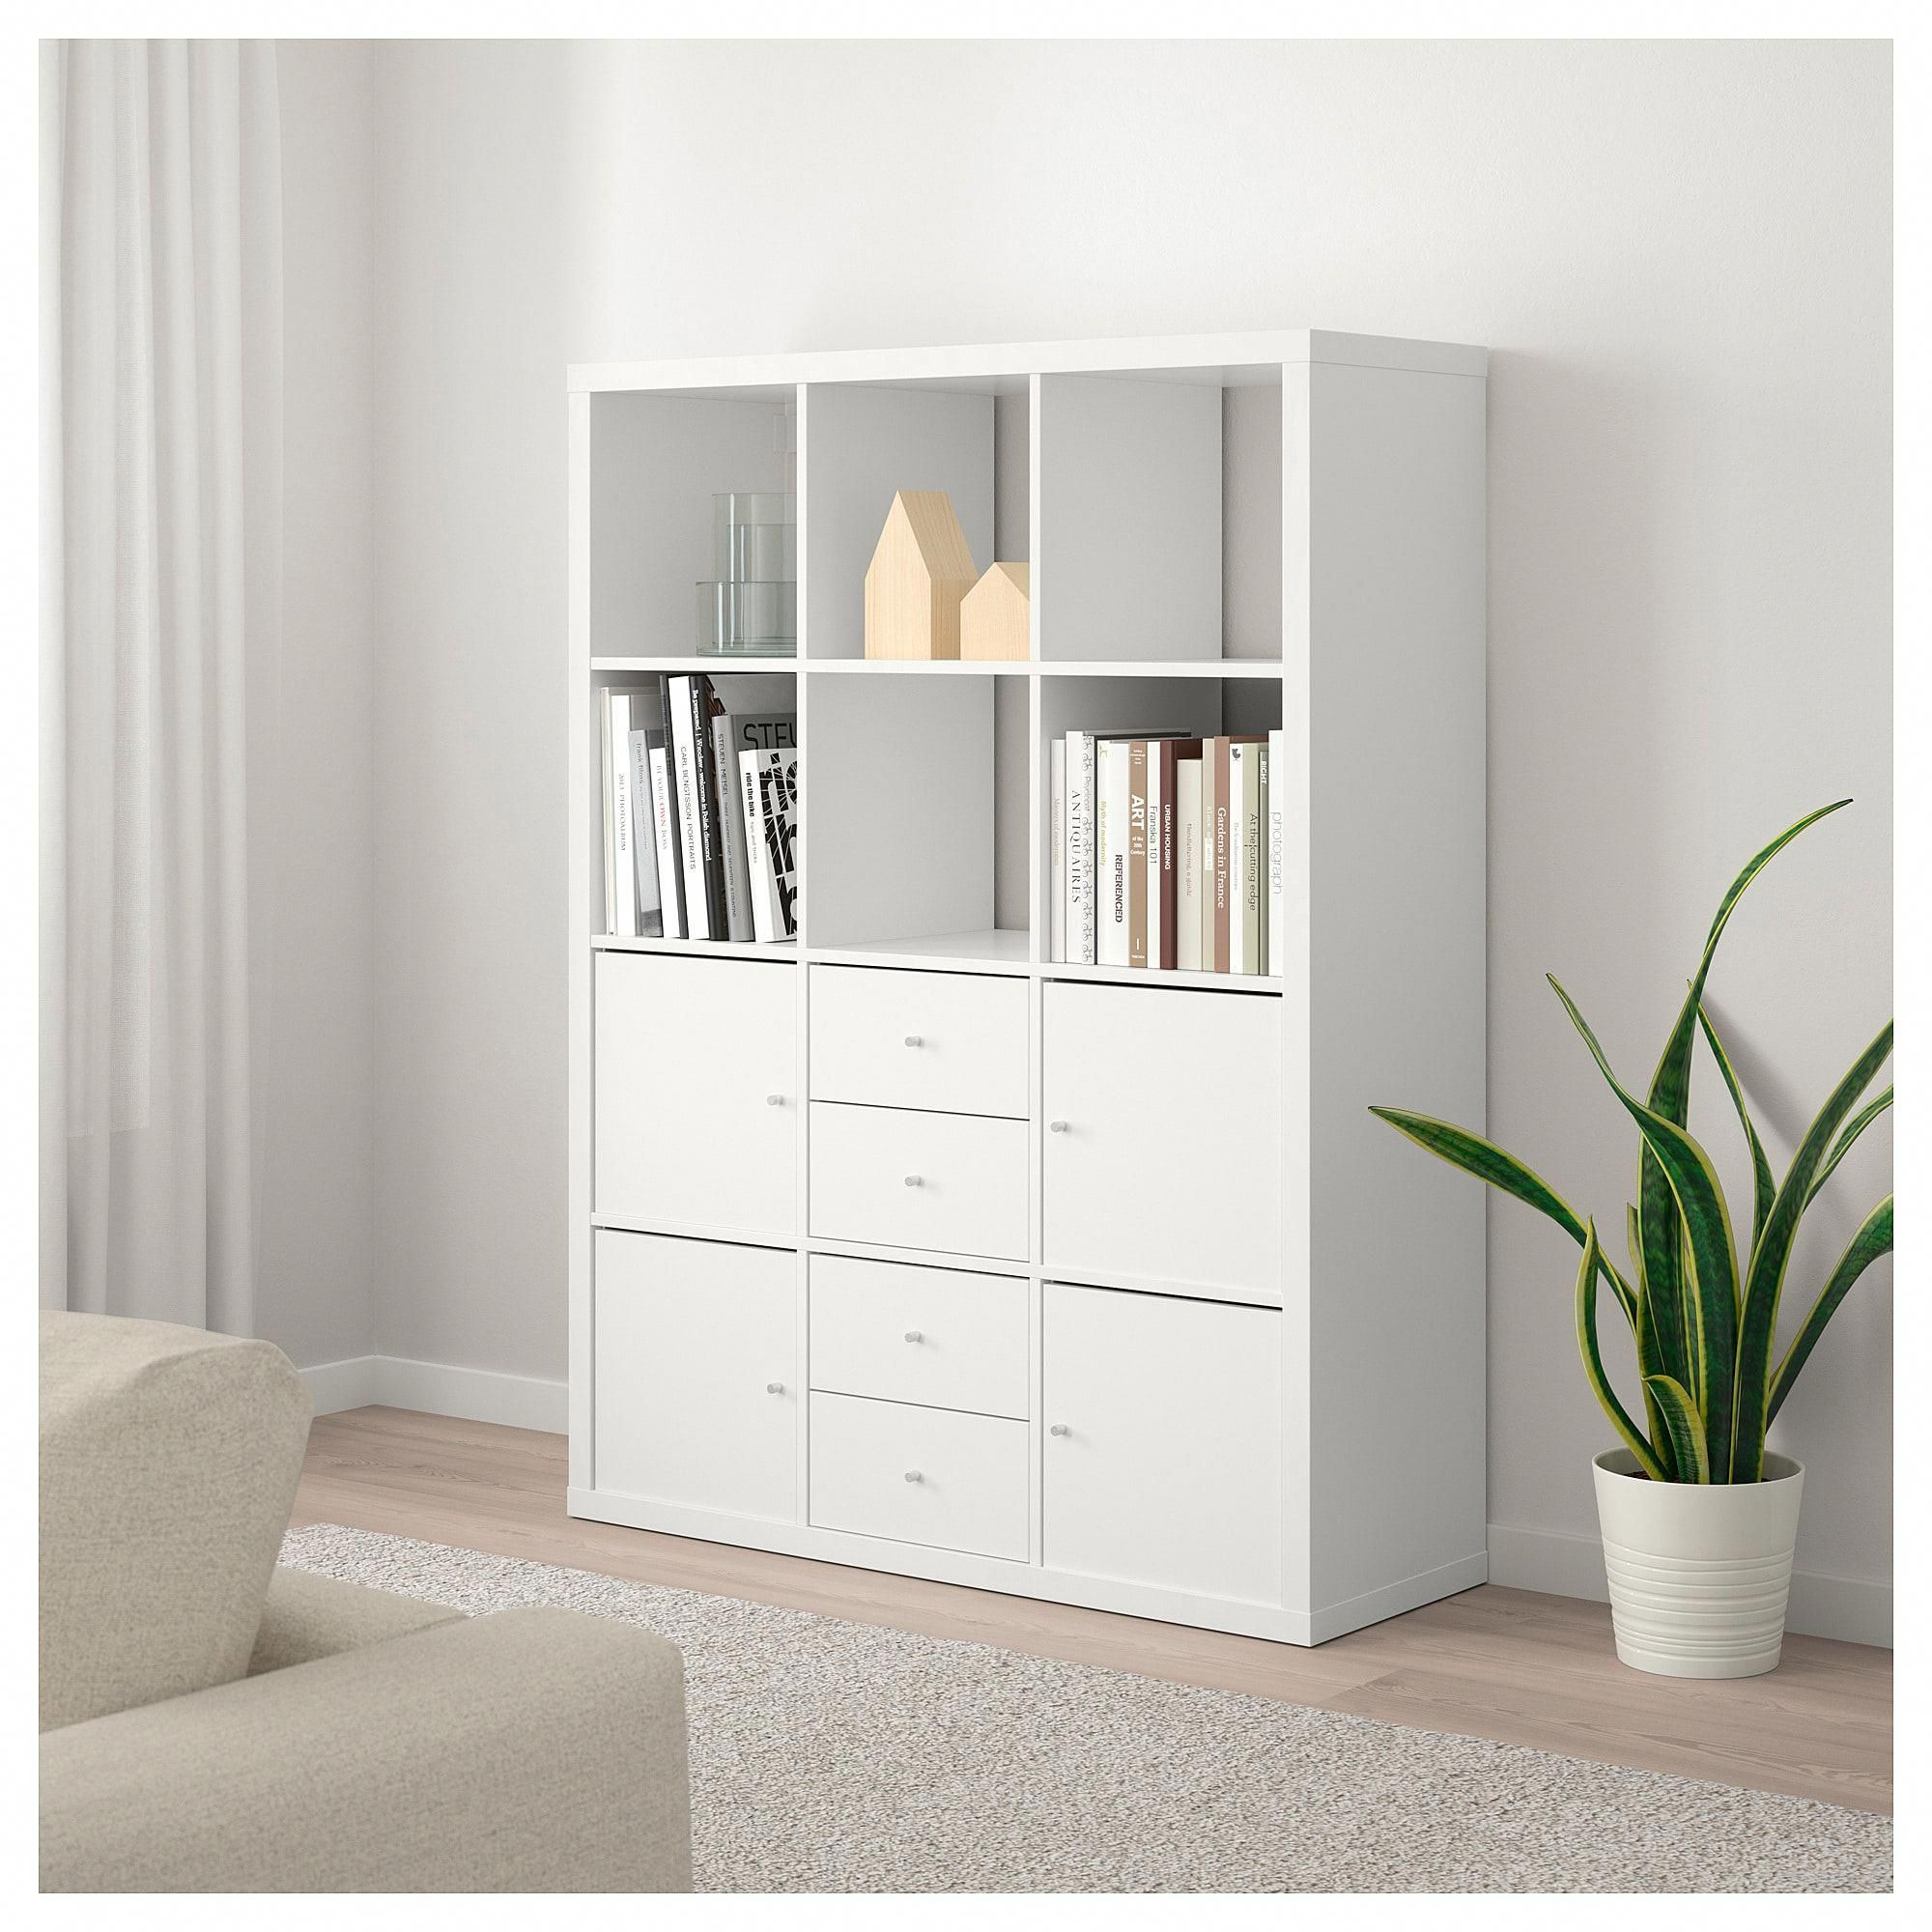 Ikea Kallax Shelving Unit With 6 Inserts White